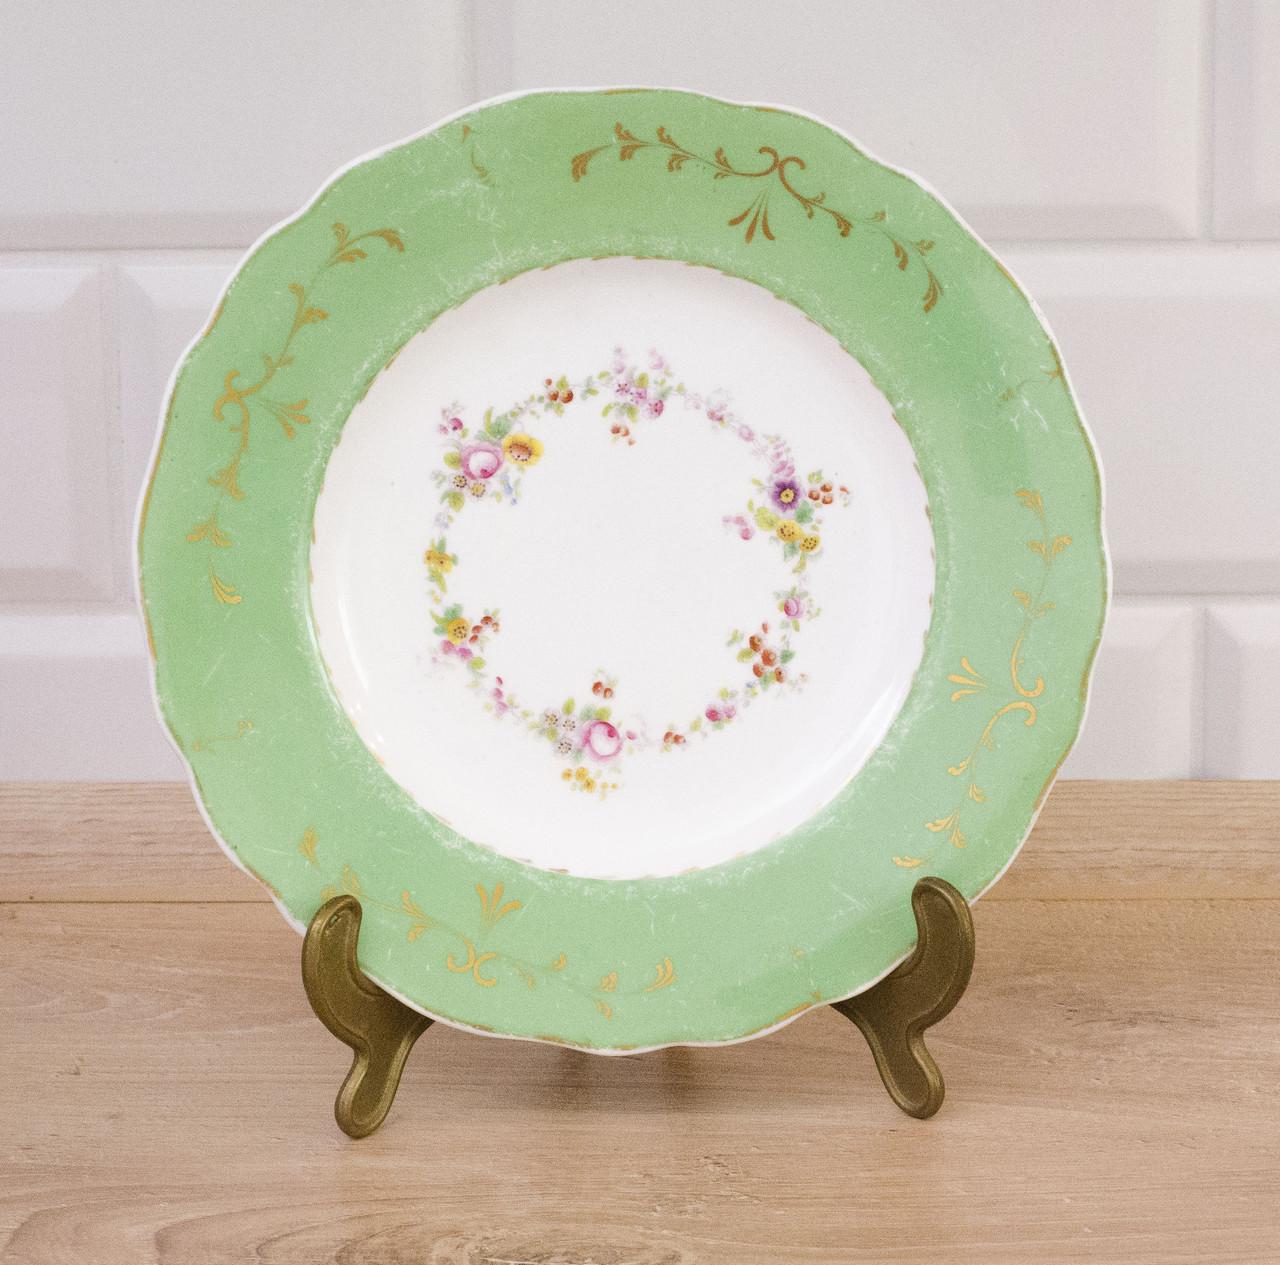 Старое фарфоровое блюдо, фарфор, Англия, фарфоровая тарелка